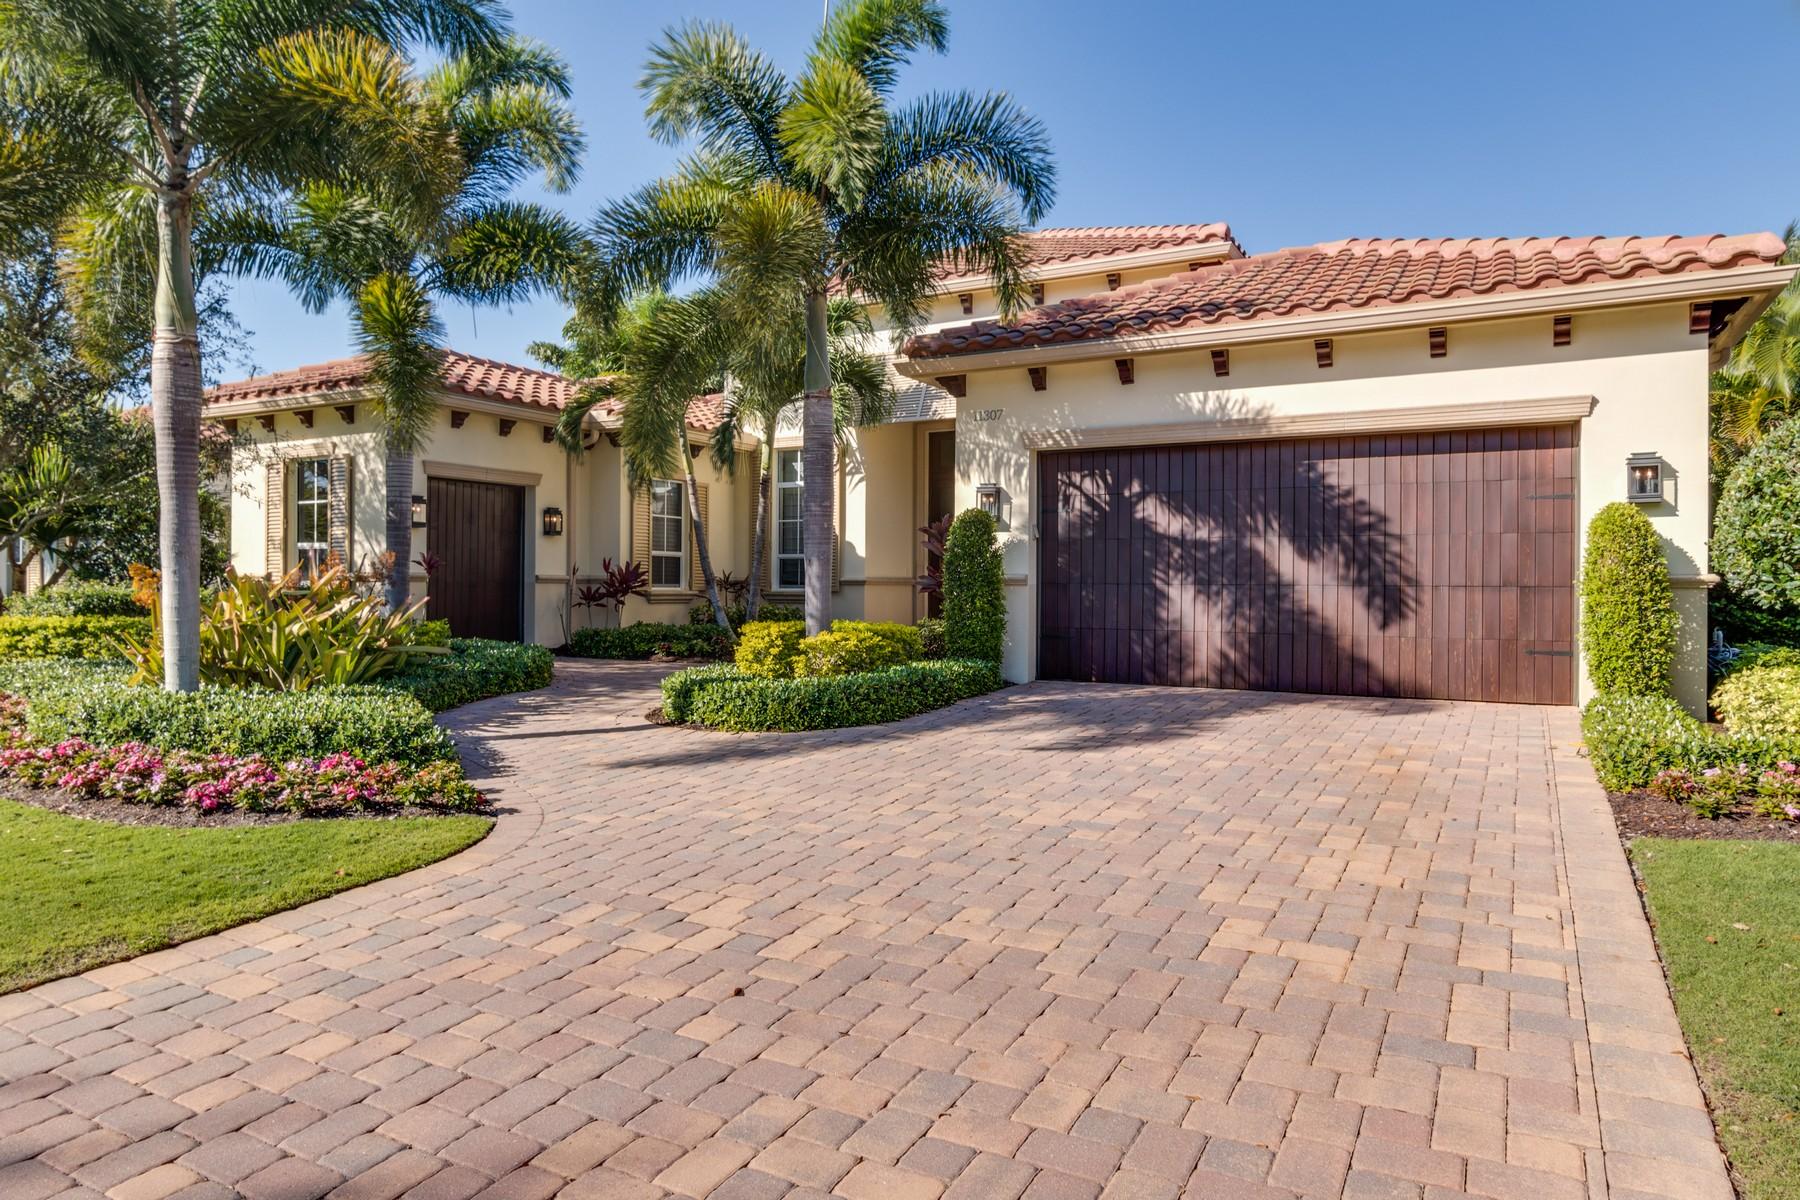 Single Family Home for Sale at 11307 Caladium Lane Old Palm Golf Club, Palm Beach Gardens, Florida, 33418 United States